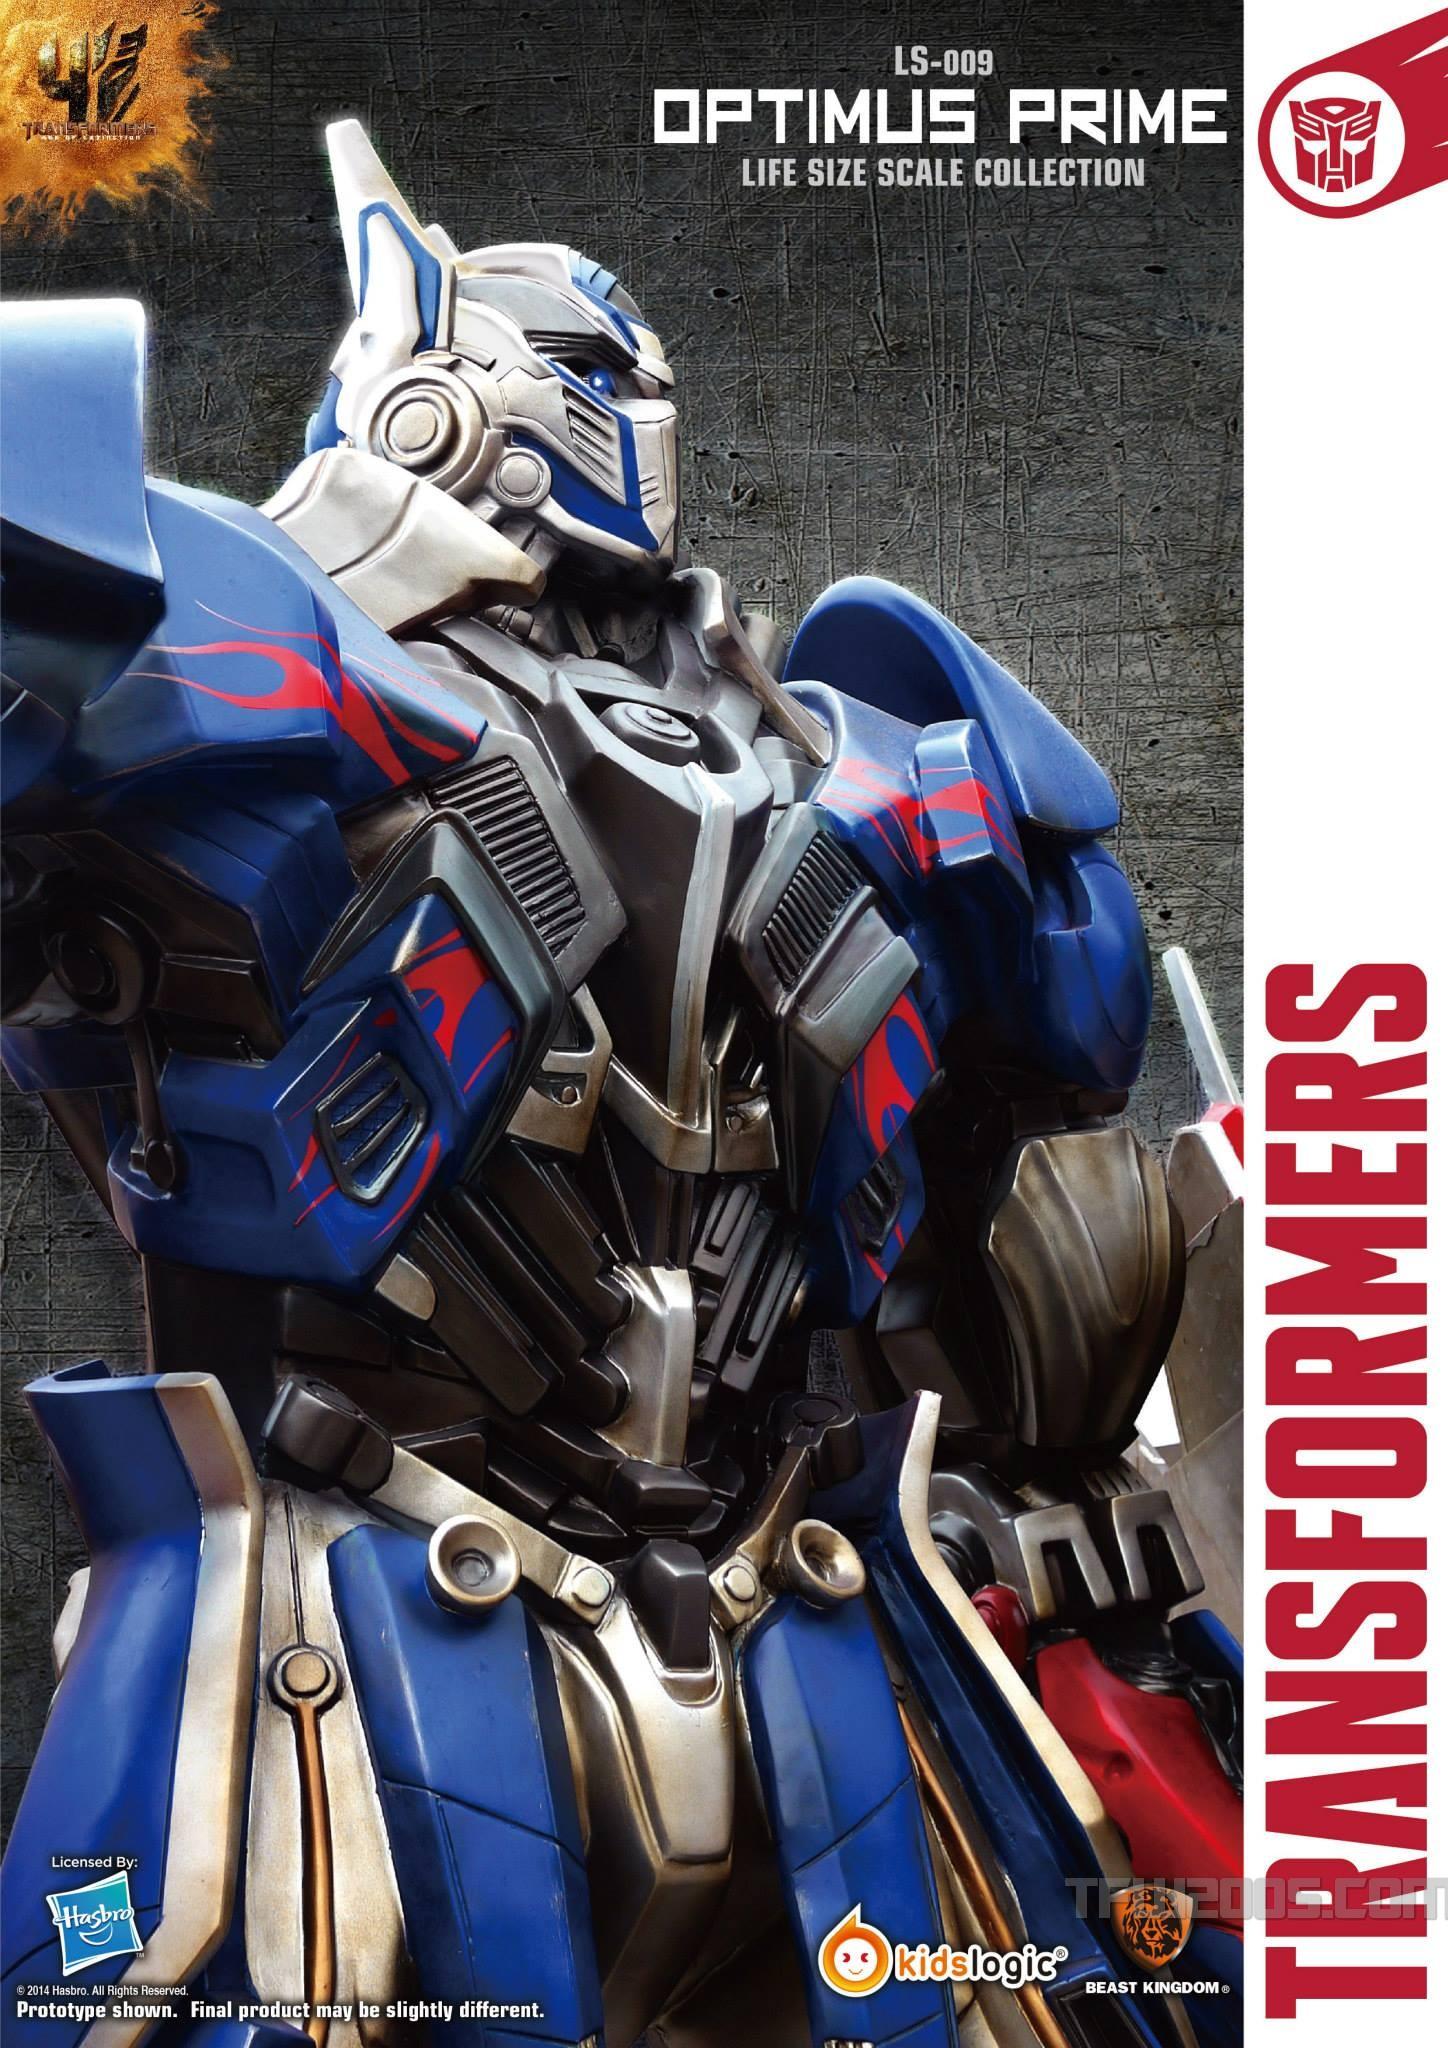 -Logic-Beast-Kingdom-Transformers-4-Age-Of-Extinction-Optimus-Prime-5Transformers Age Of Extinction Optimus Prime Fan Art